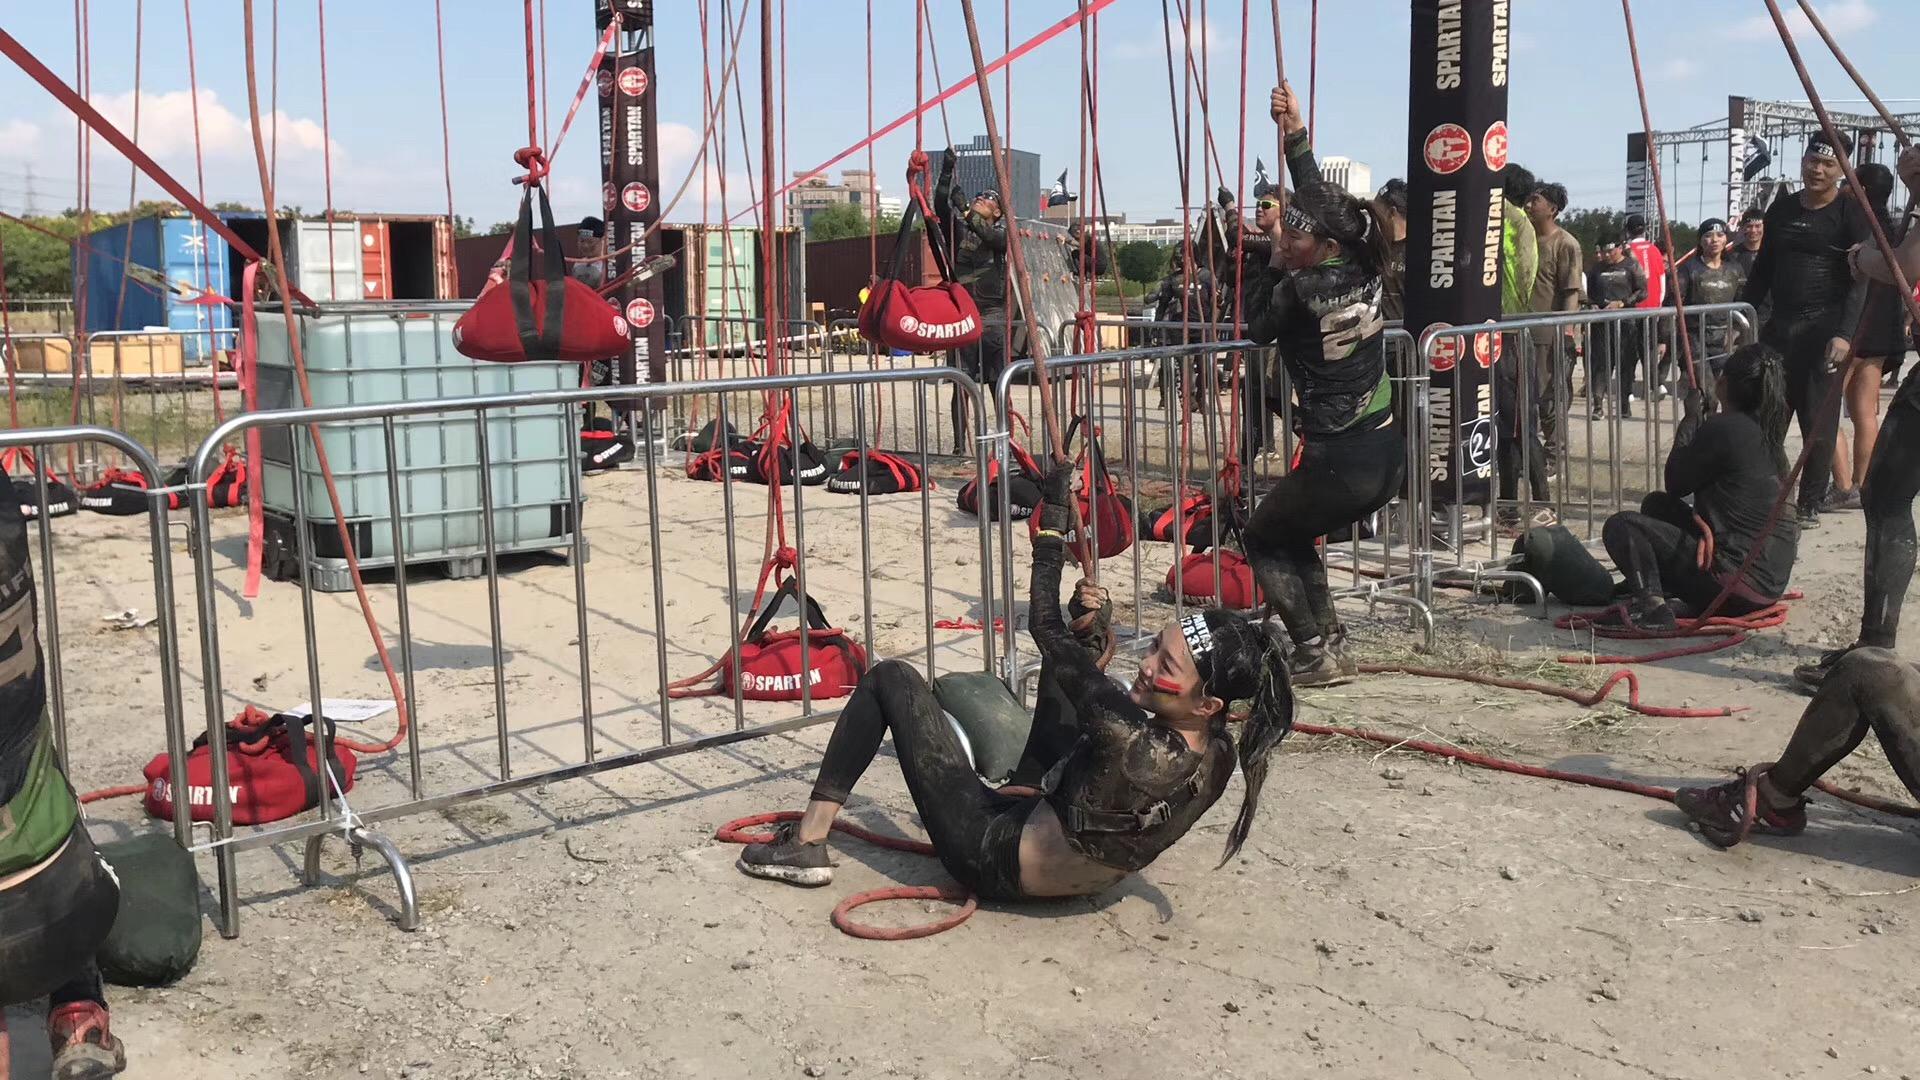 China's weekend Spartan warriors